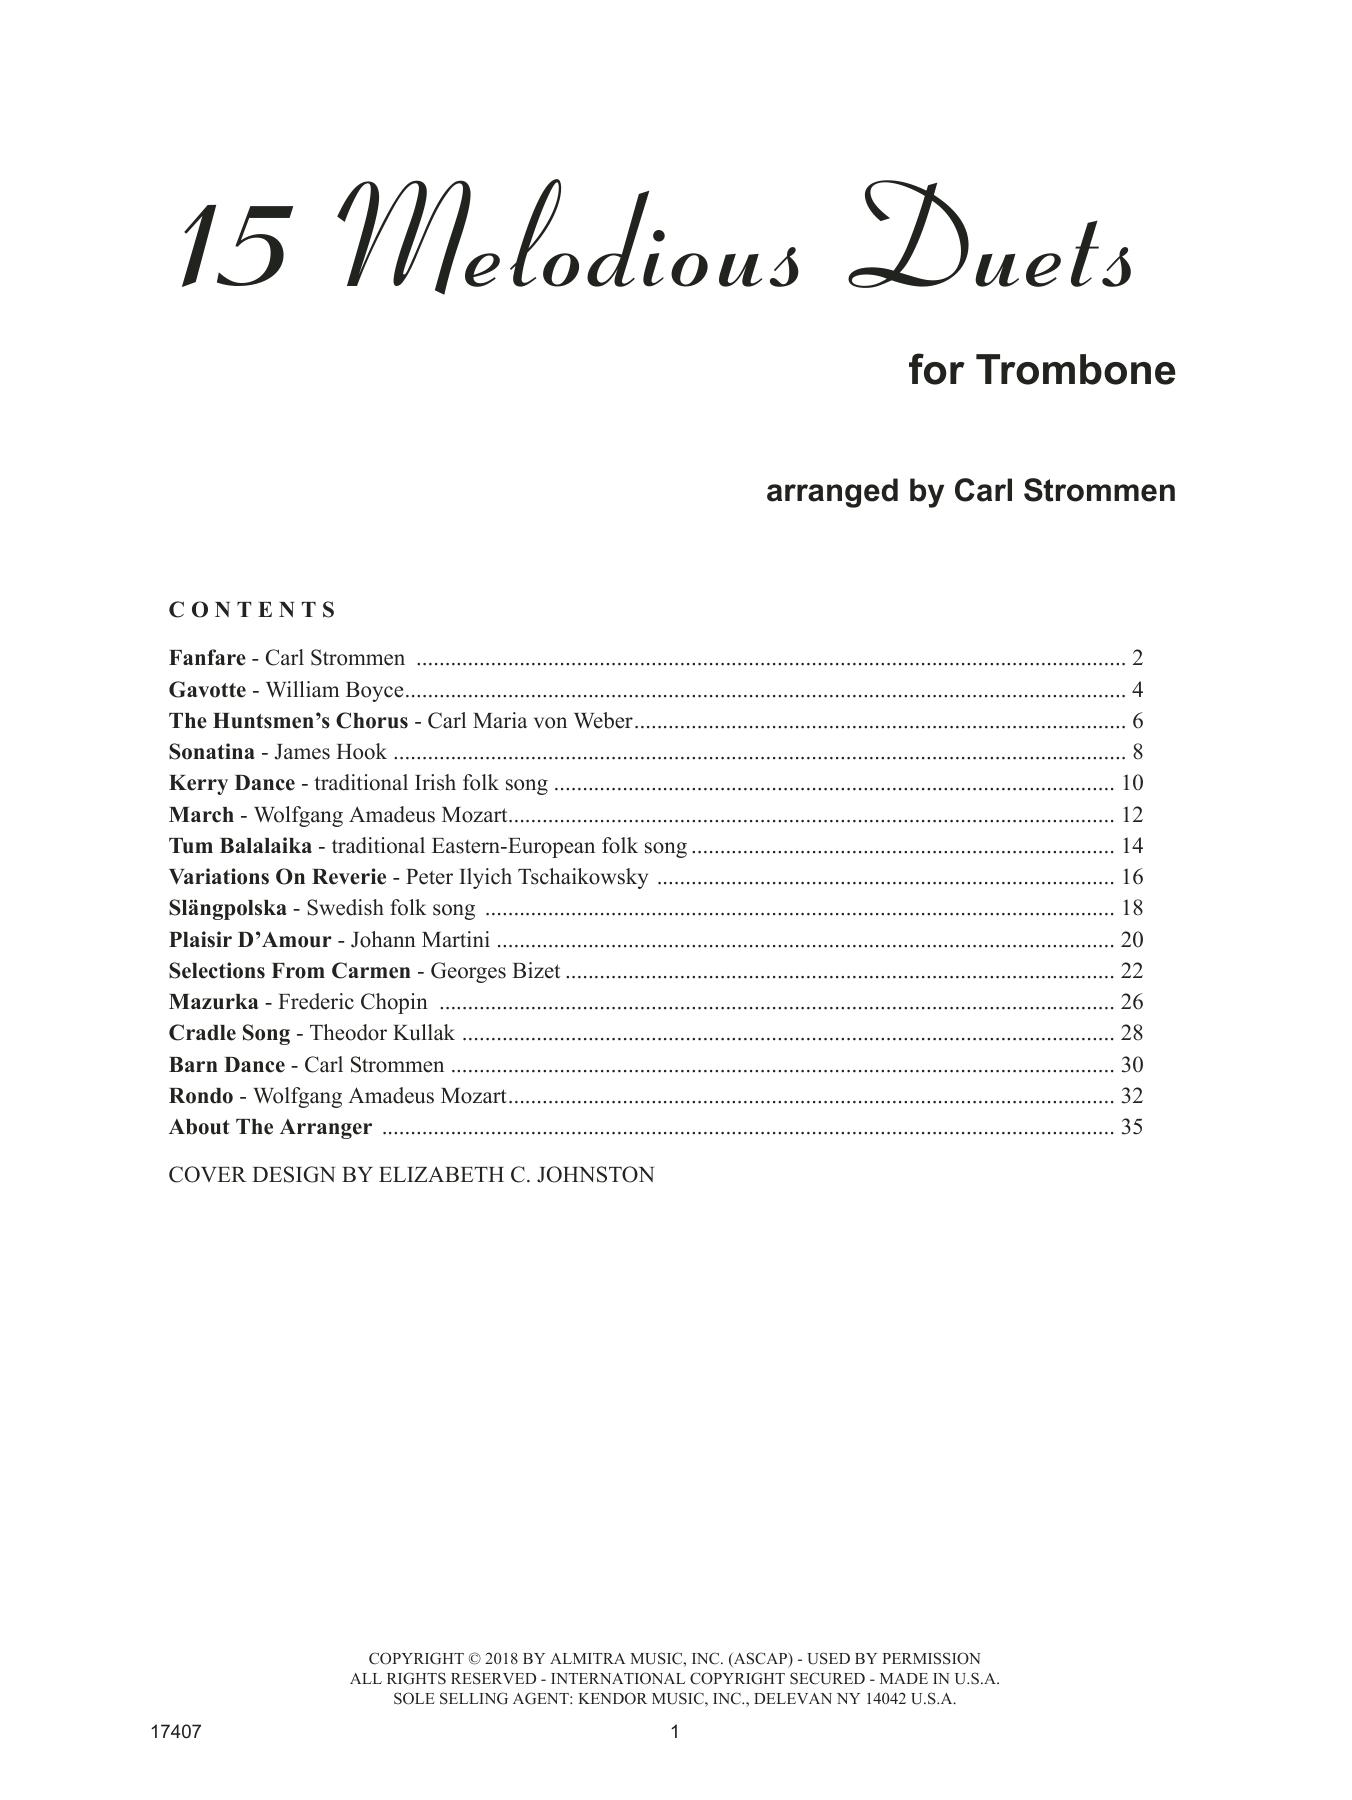 15 Melodious Duets Digitale Noten